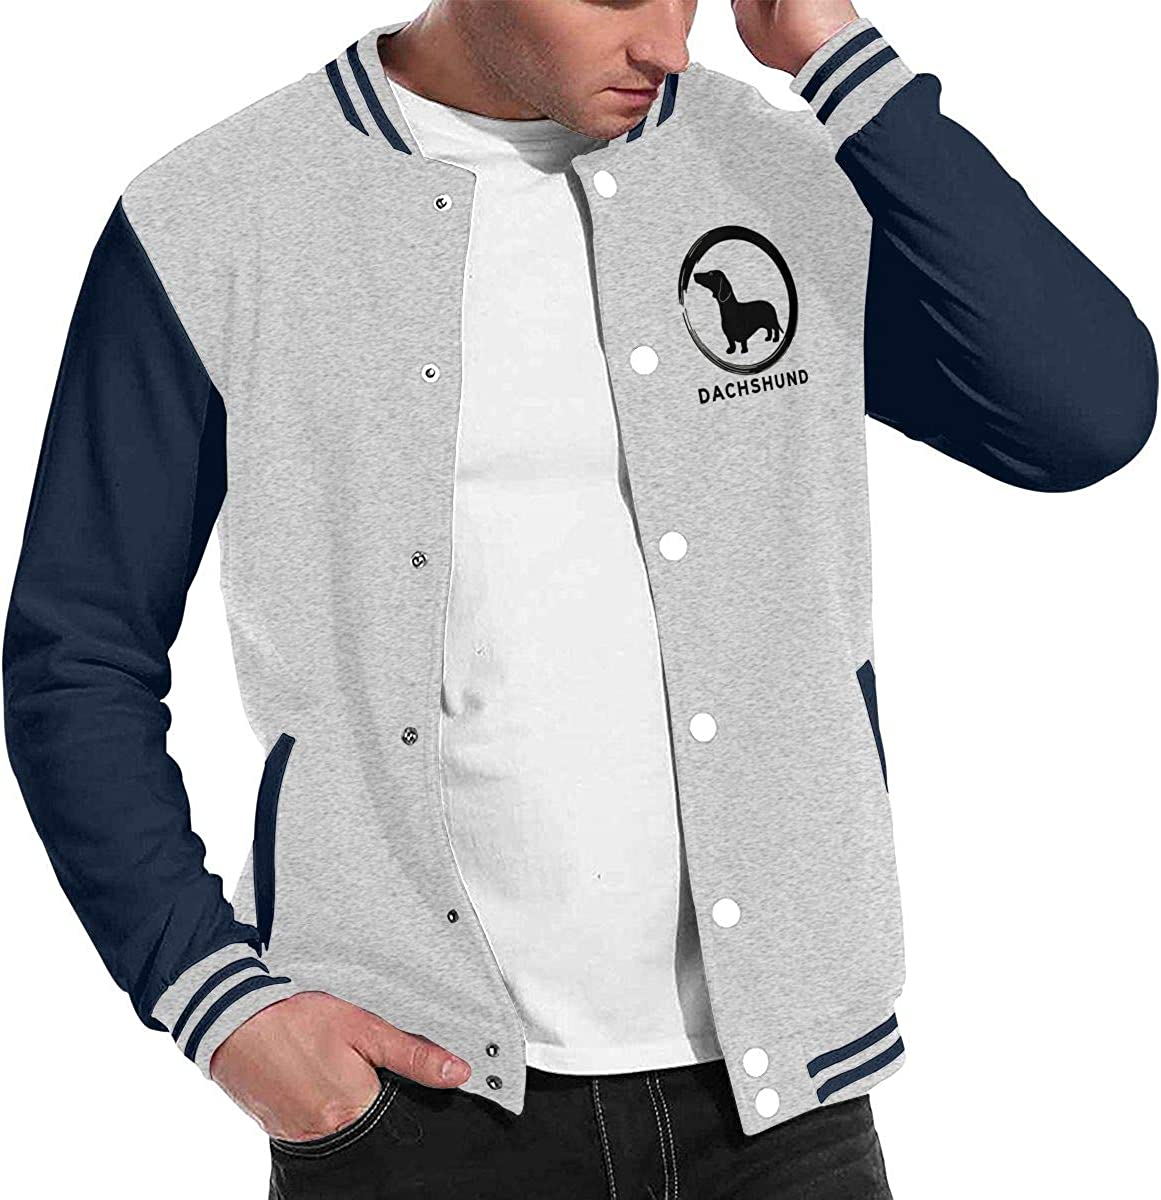 JJKKFG-H Dachshund Dog Mens Fashion Baseball Uniform Jacket Sport Coat